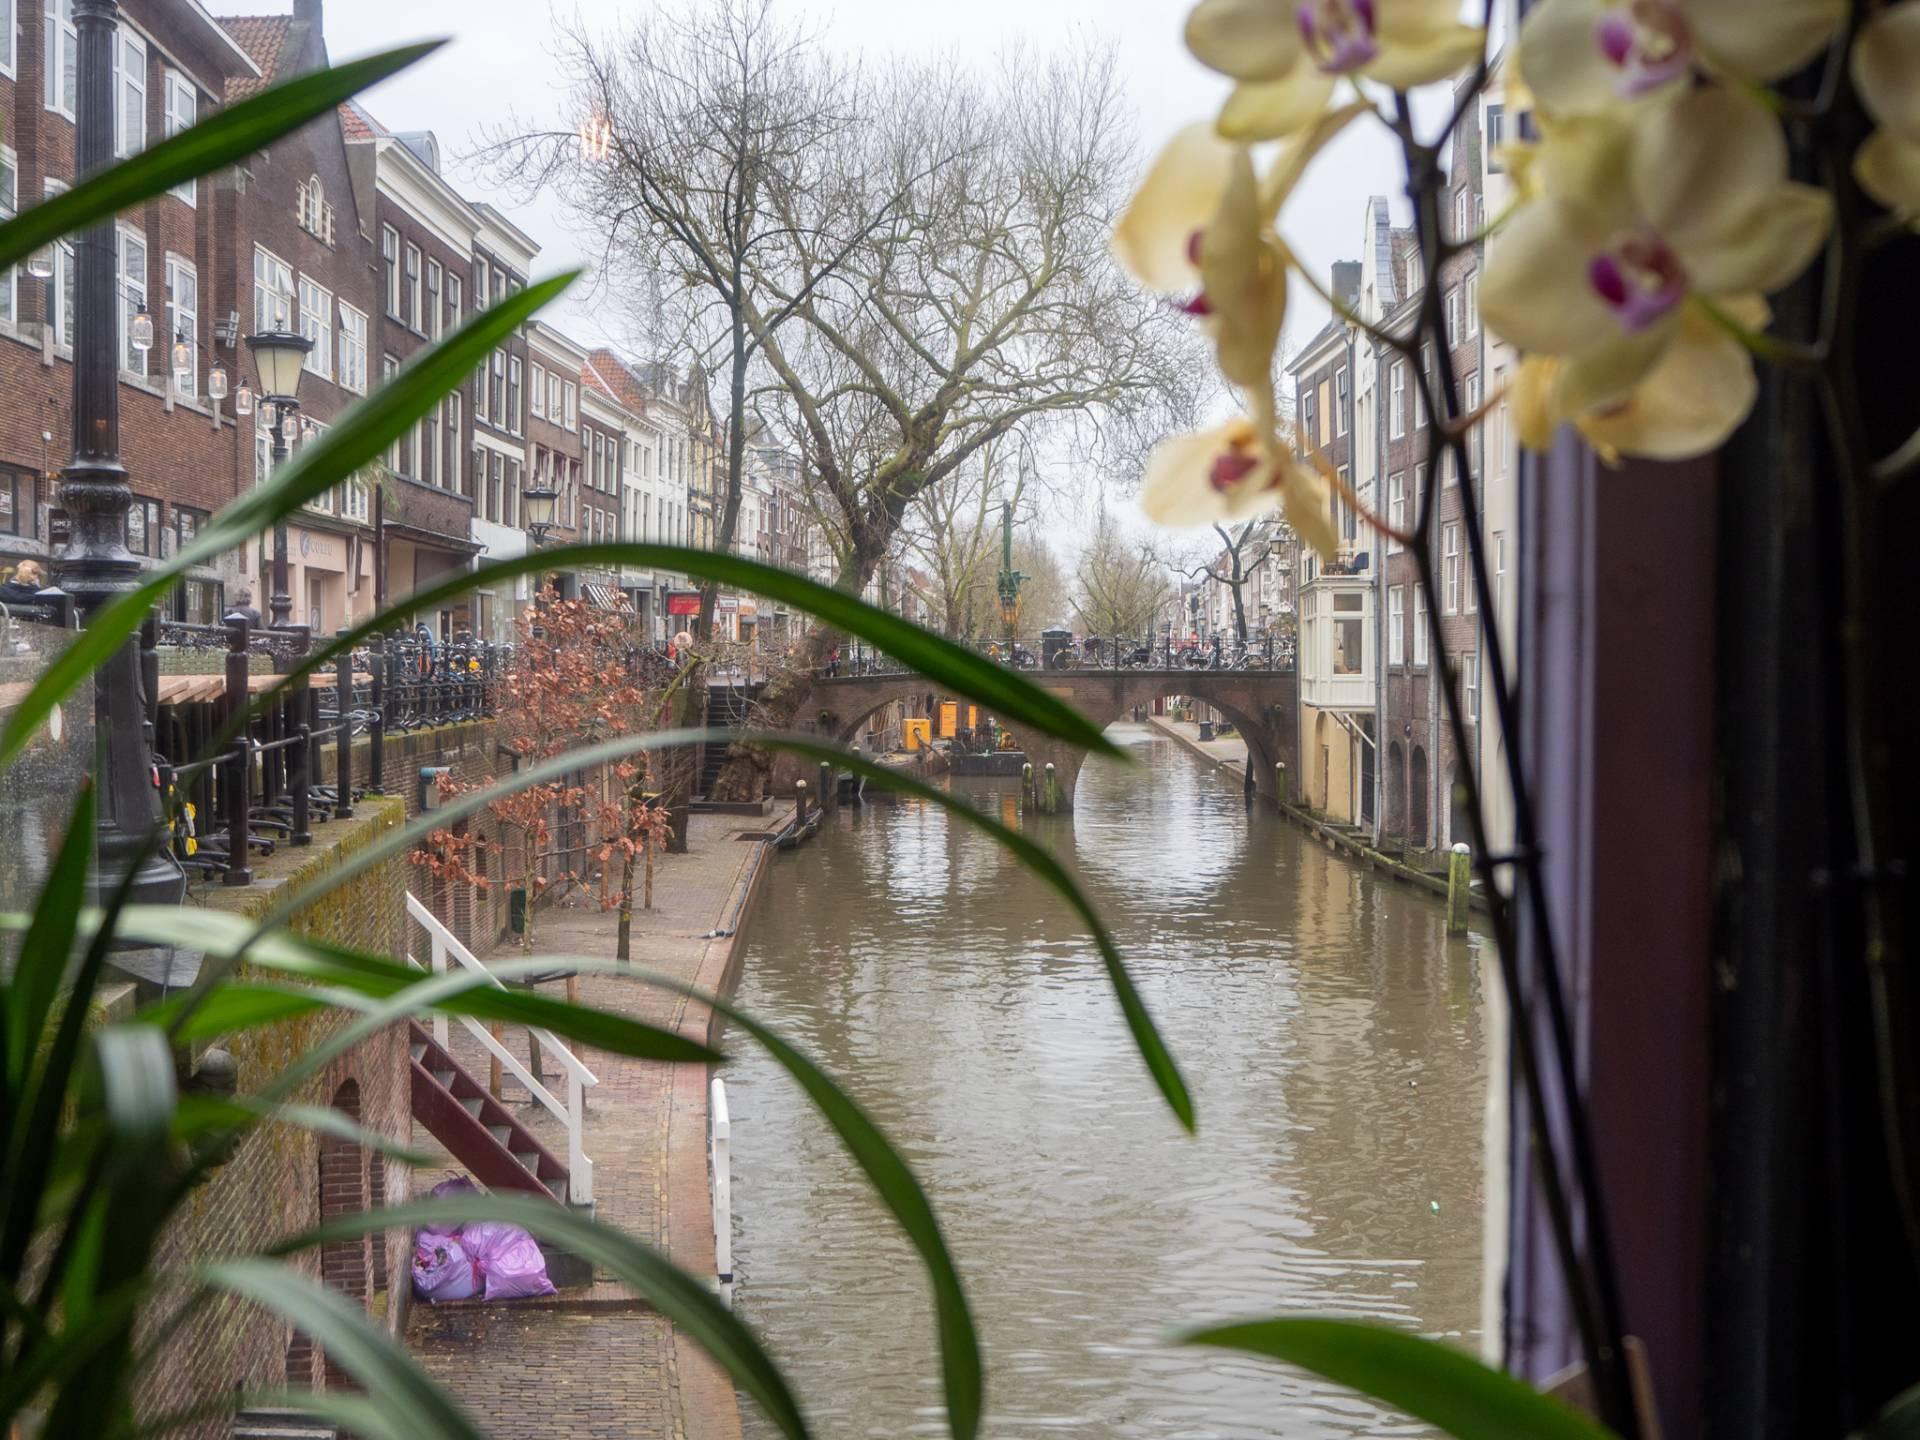 Café Heen en Weer - day trip to Utrecht from Amsterdam